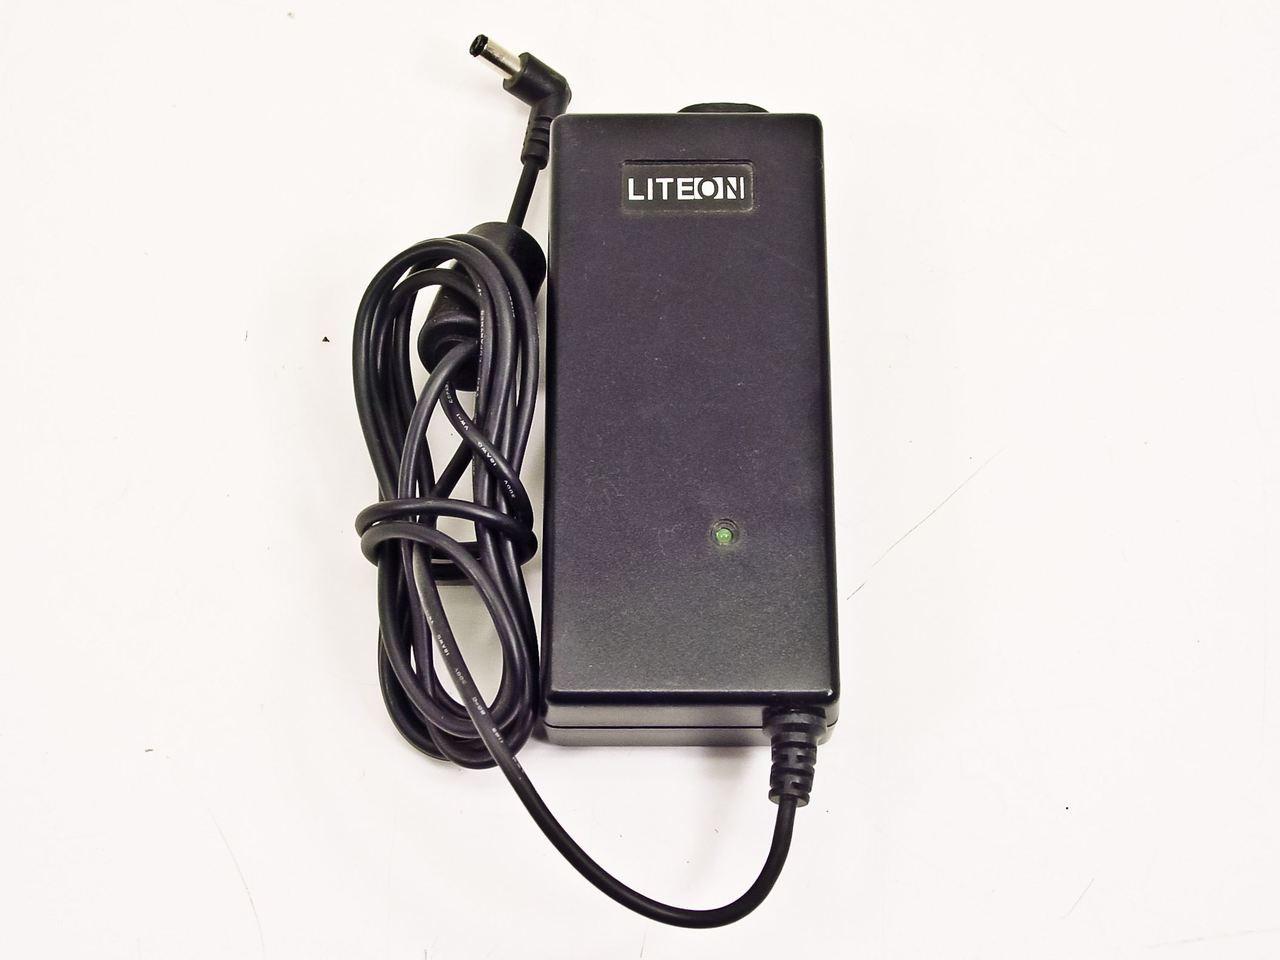 Harga Jual Adaptor Notebook 12v Dc Laptop Charger Acer Suppliers Lenovo 120w Ac Adapter 195v615a Ce Lite On 18v